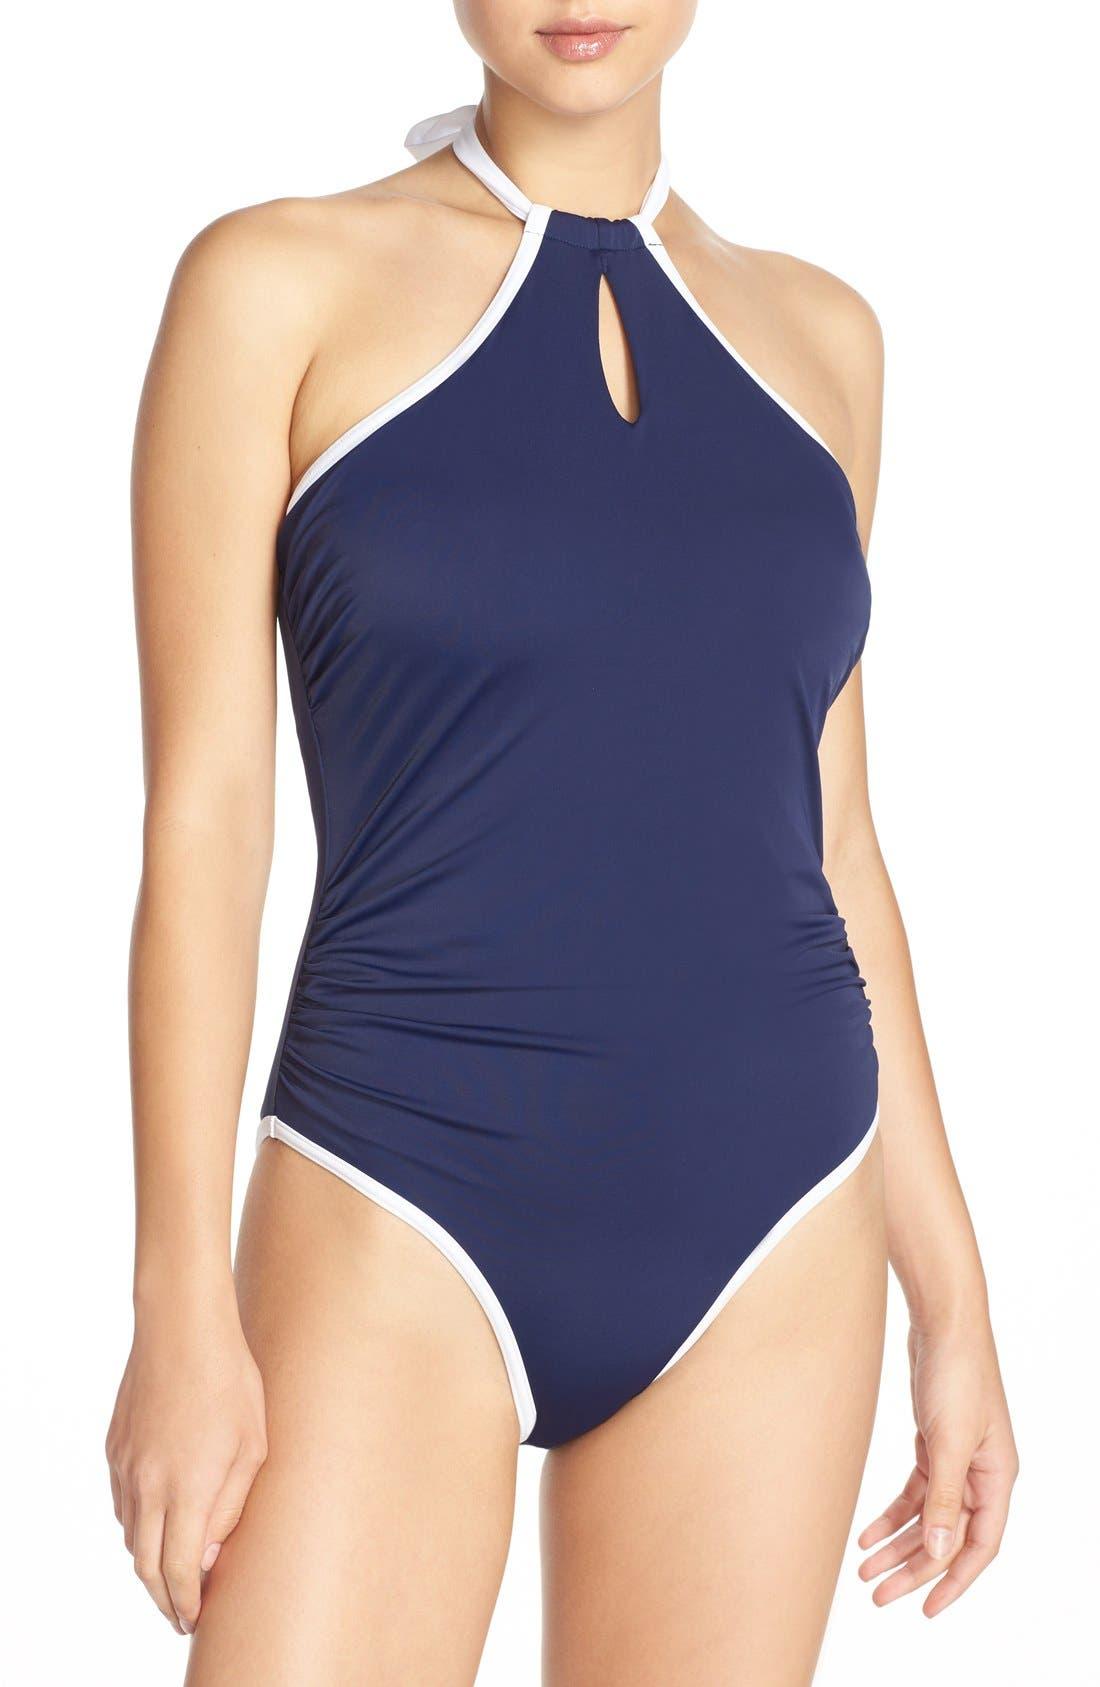 FREYA 'In the Navy' Underwire One-Piece Swimsuit